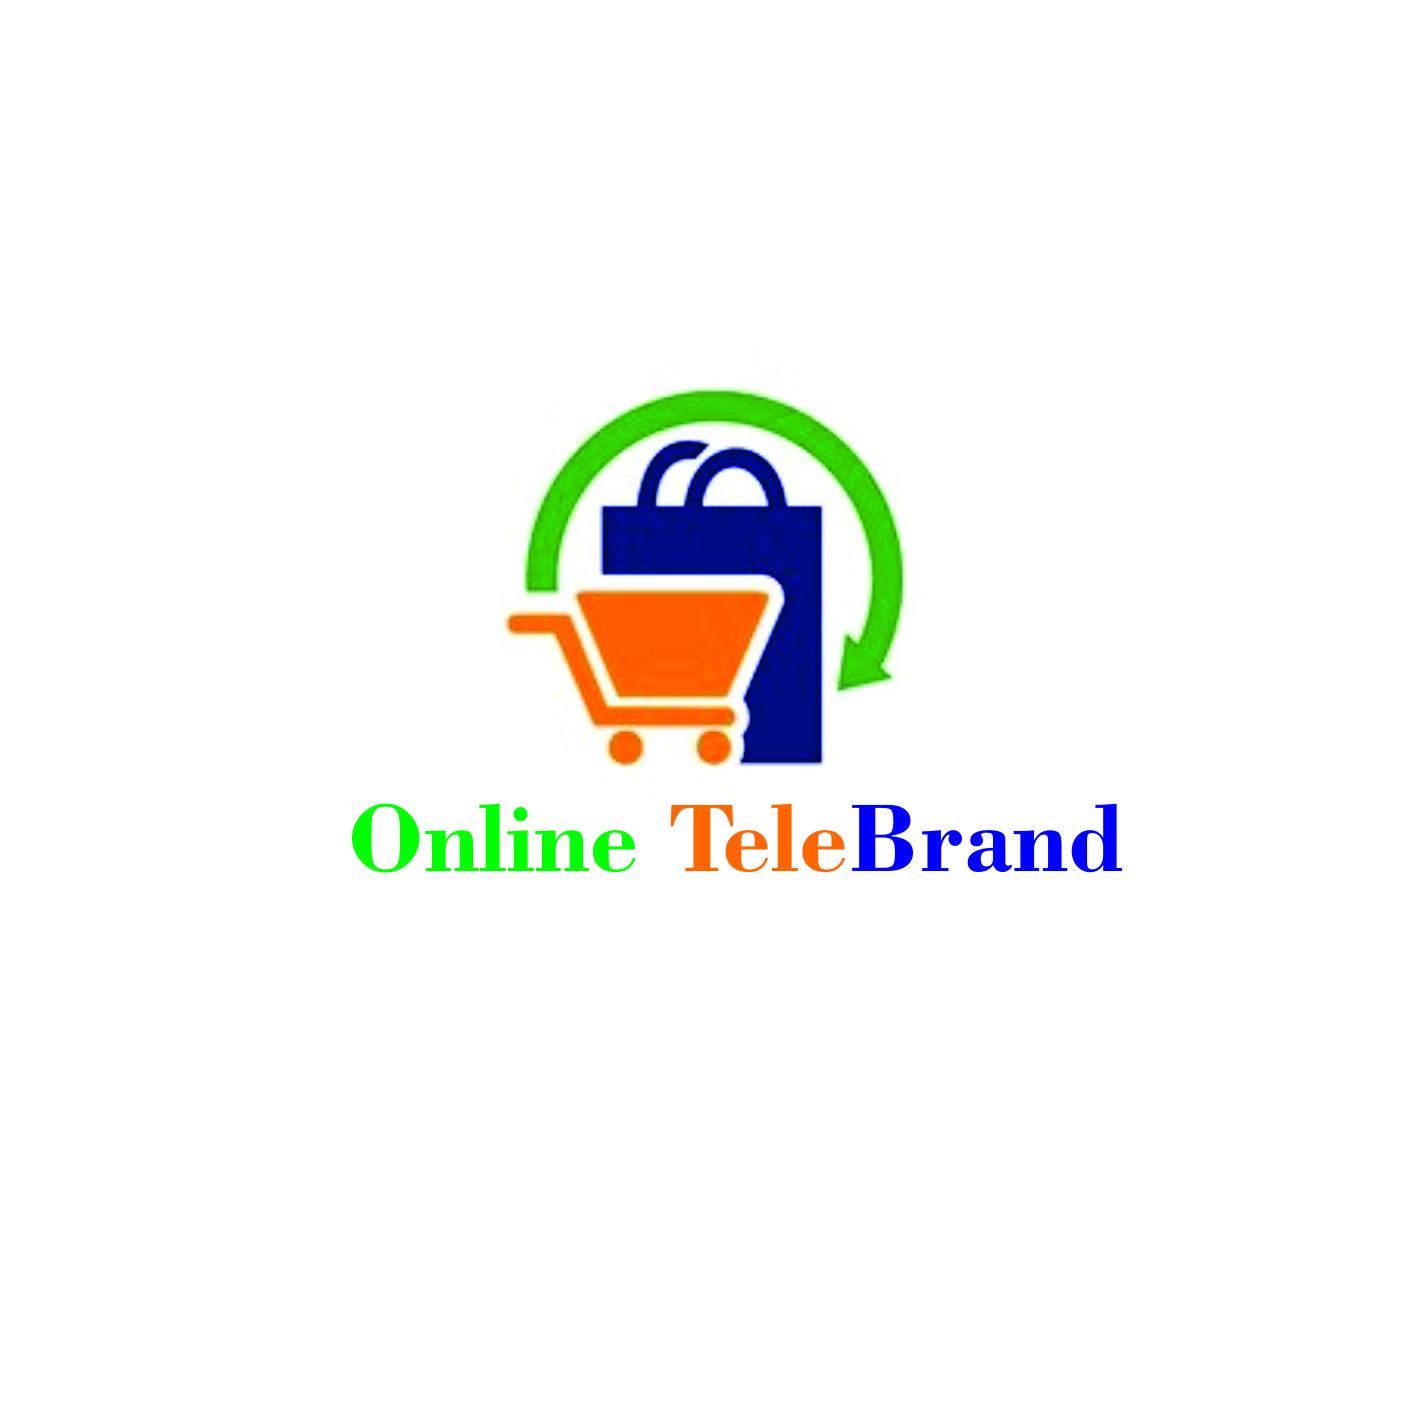 Online telebrand online shopping company in pakistan in